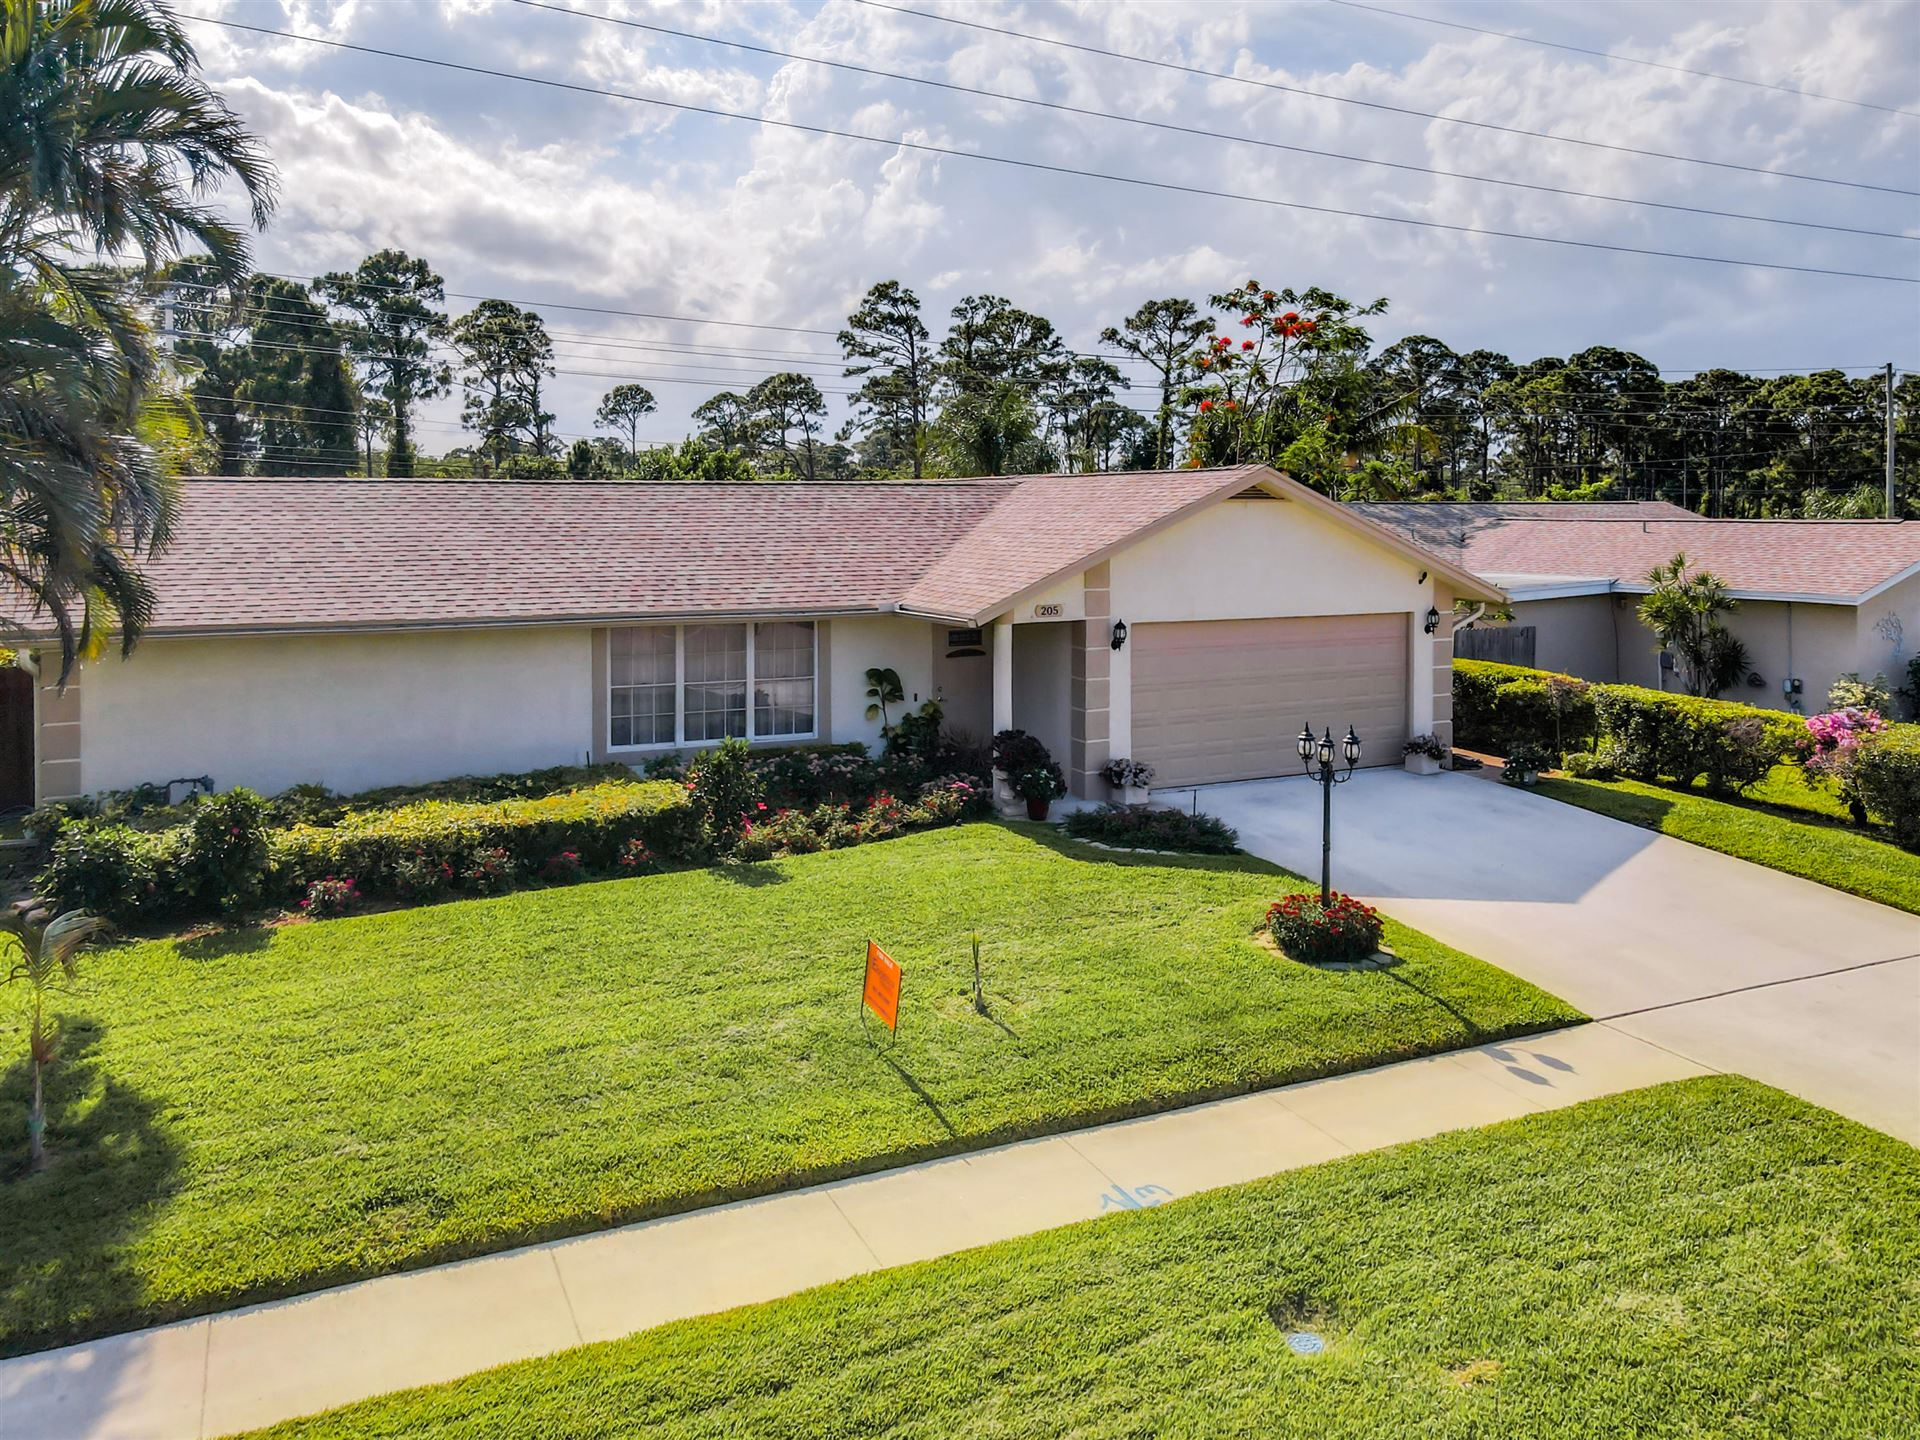 205 Canterbury Drive W, West Palm Beach, FL 33407 - MLS#: RX-10715870